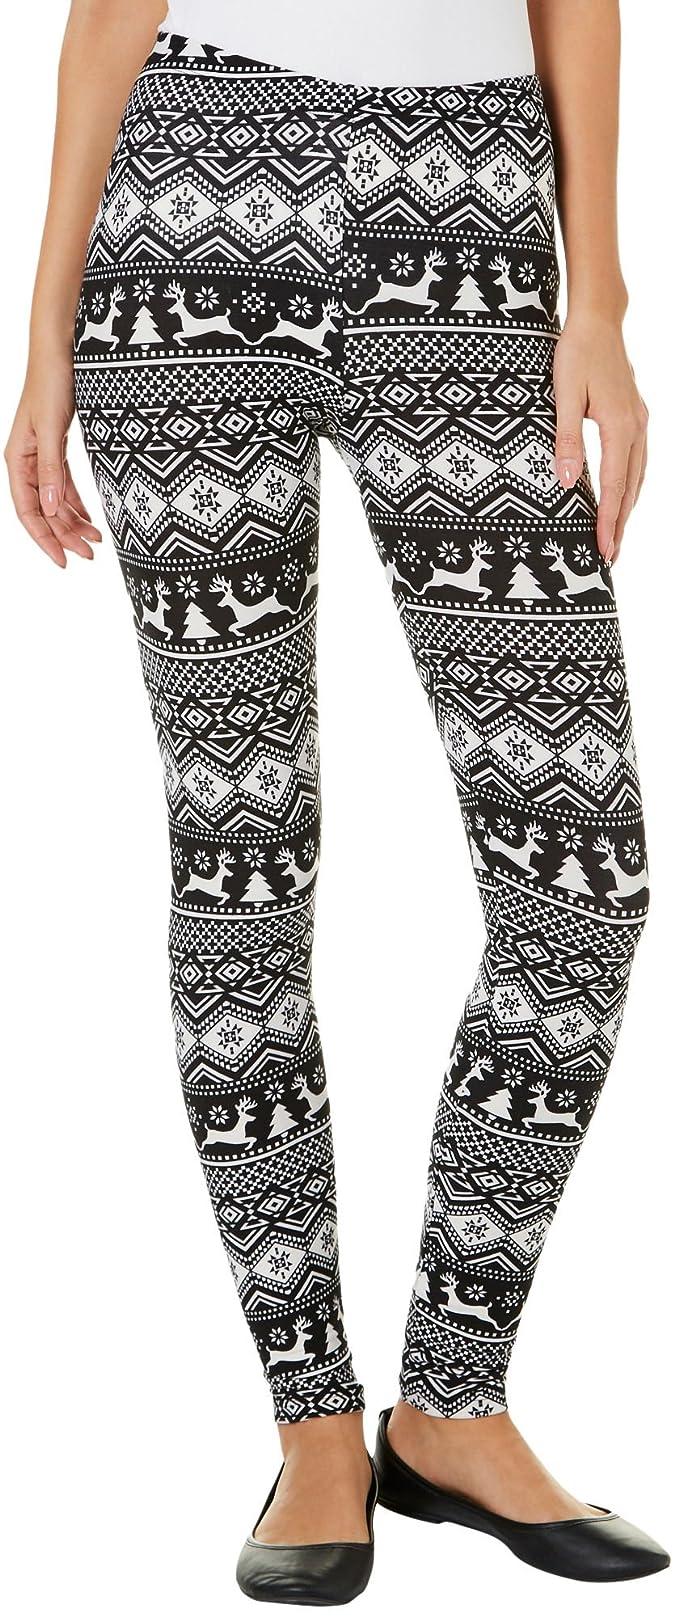 9a9b7a56669dff Derek Heart Juniors Reindeer Aztec Print Leggings [3YKIg0200006 ...